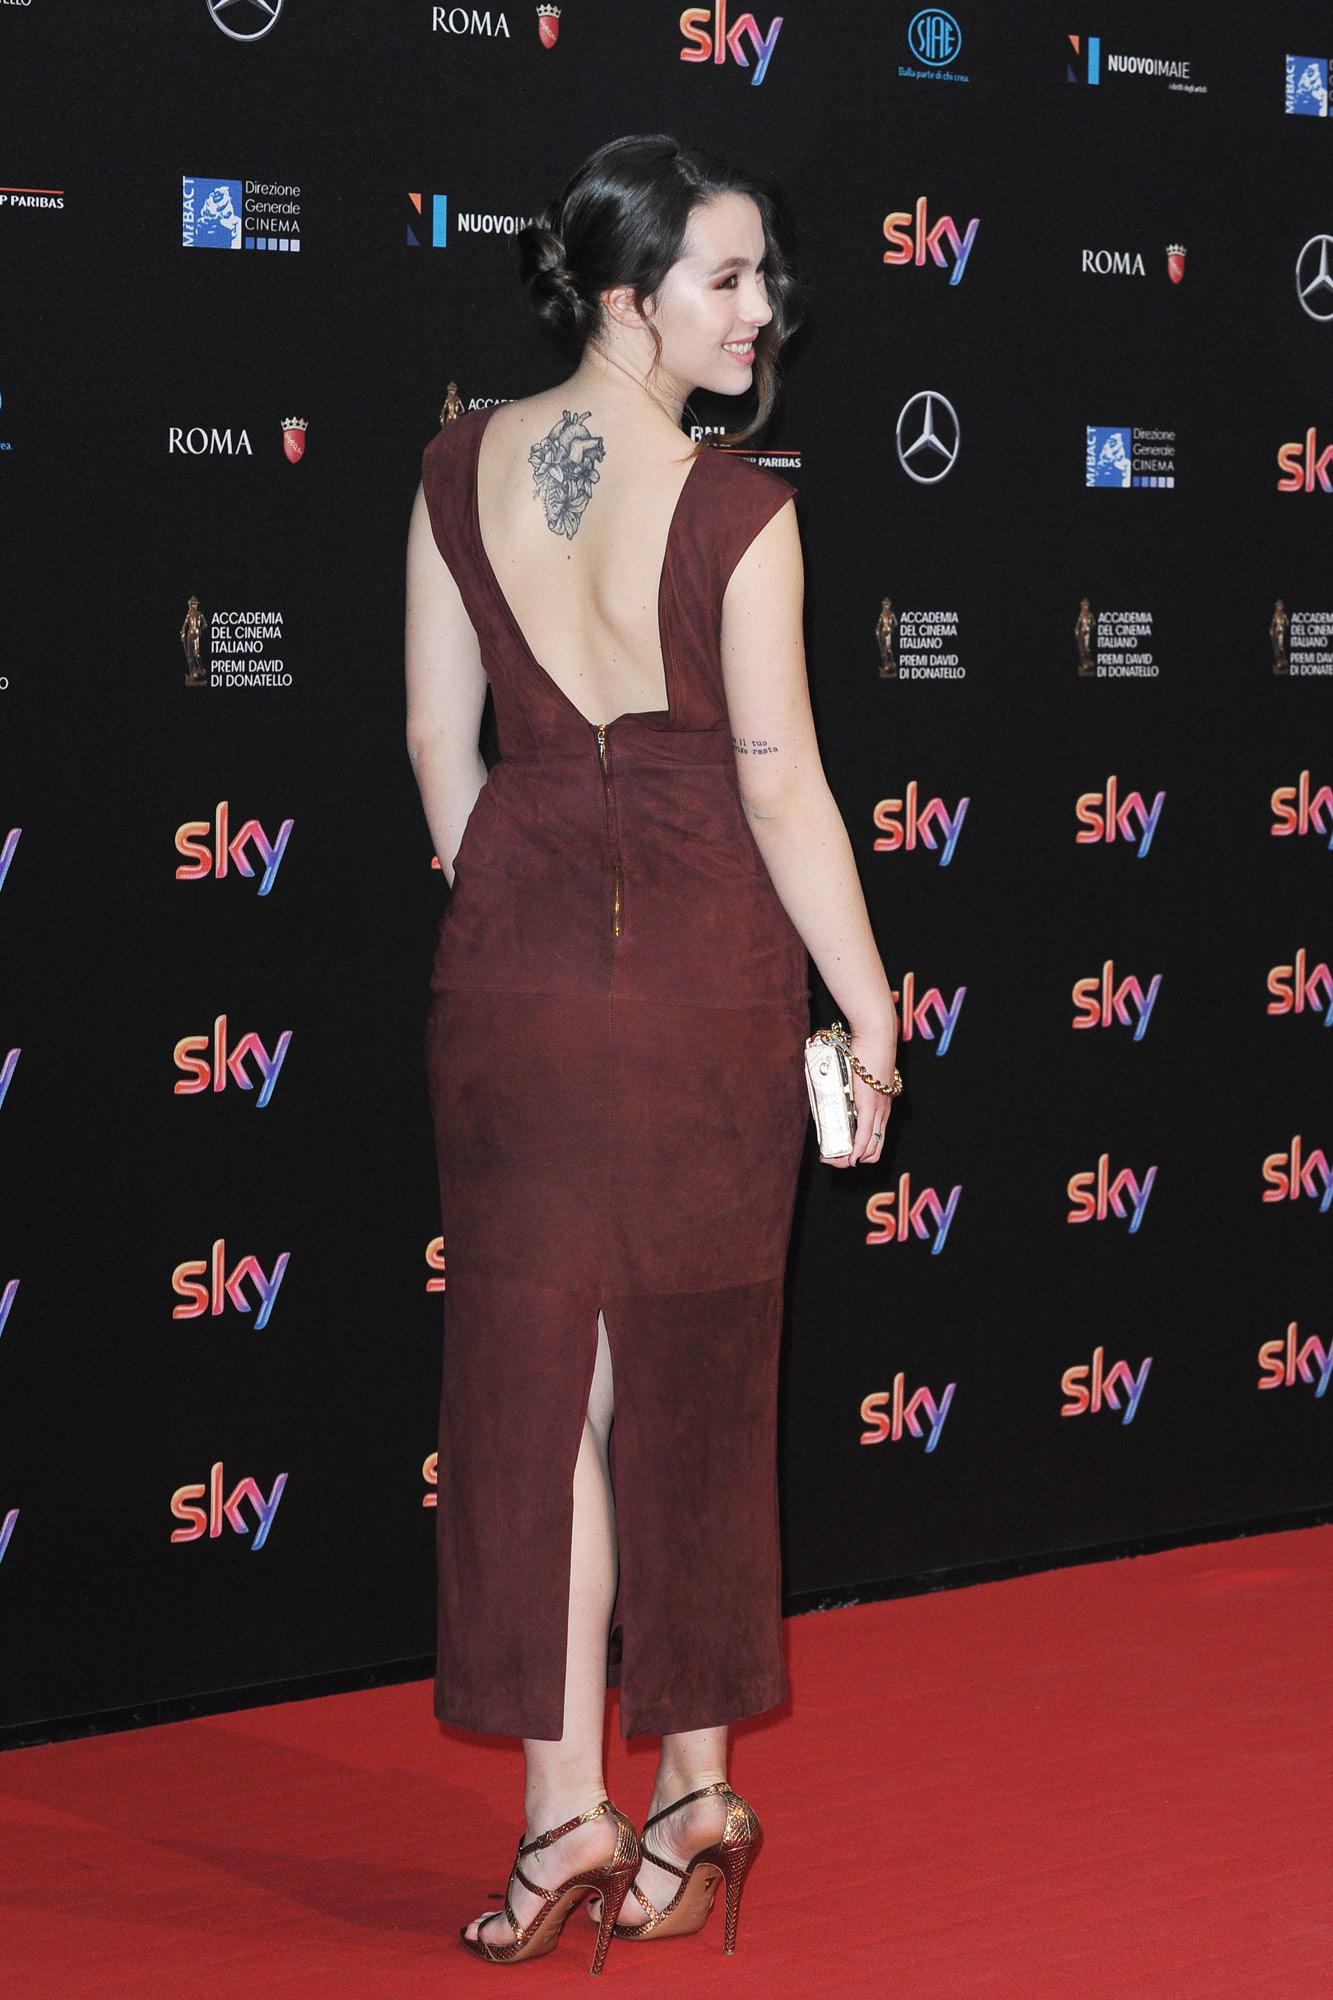 Aurora, sul red carpet è lei la più... tatuata